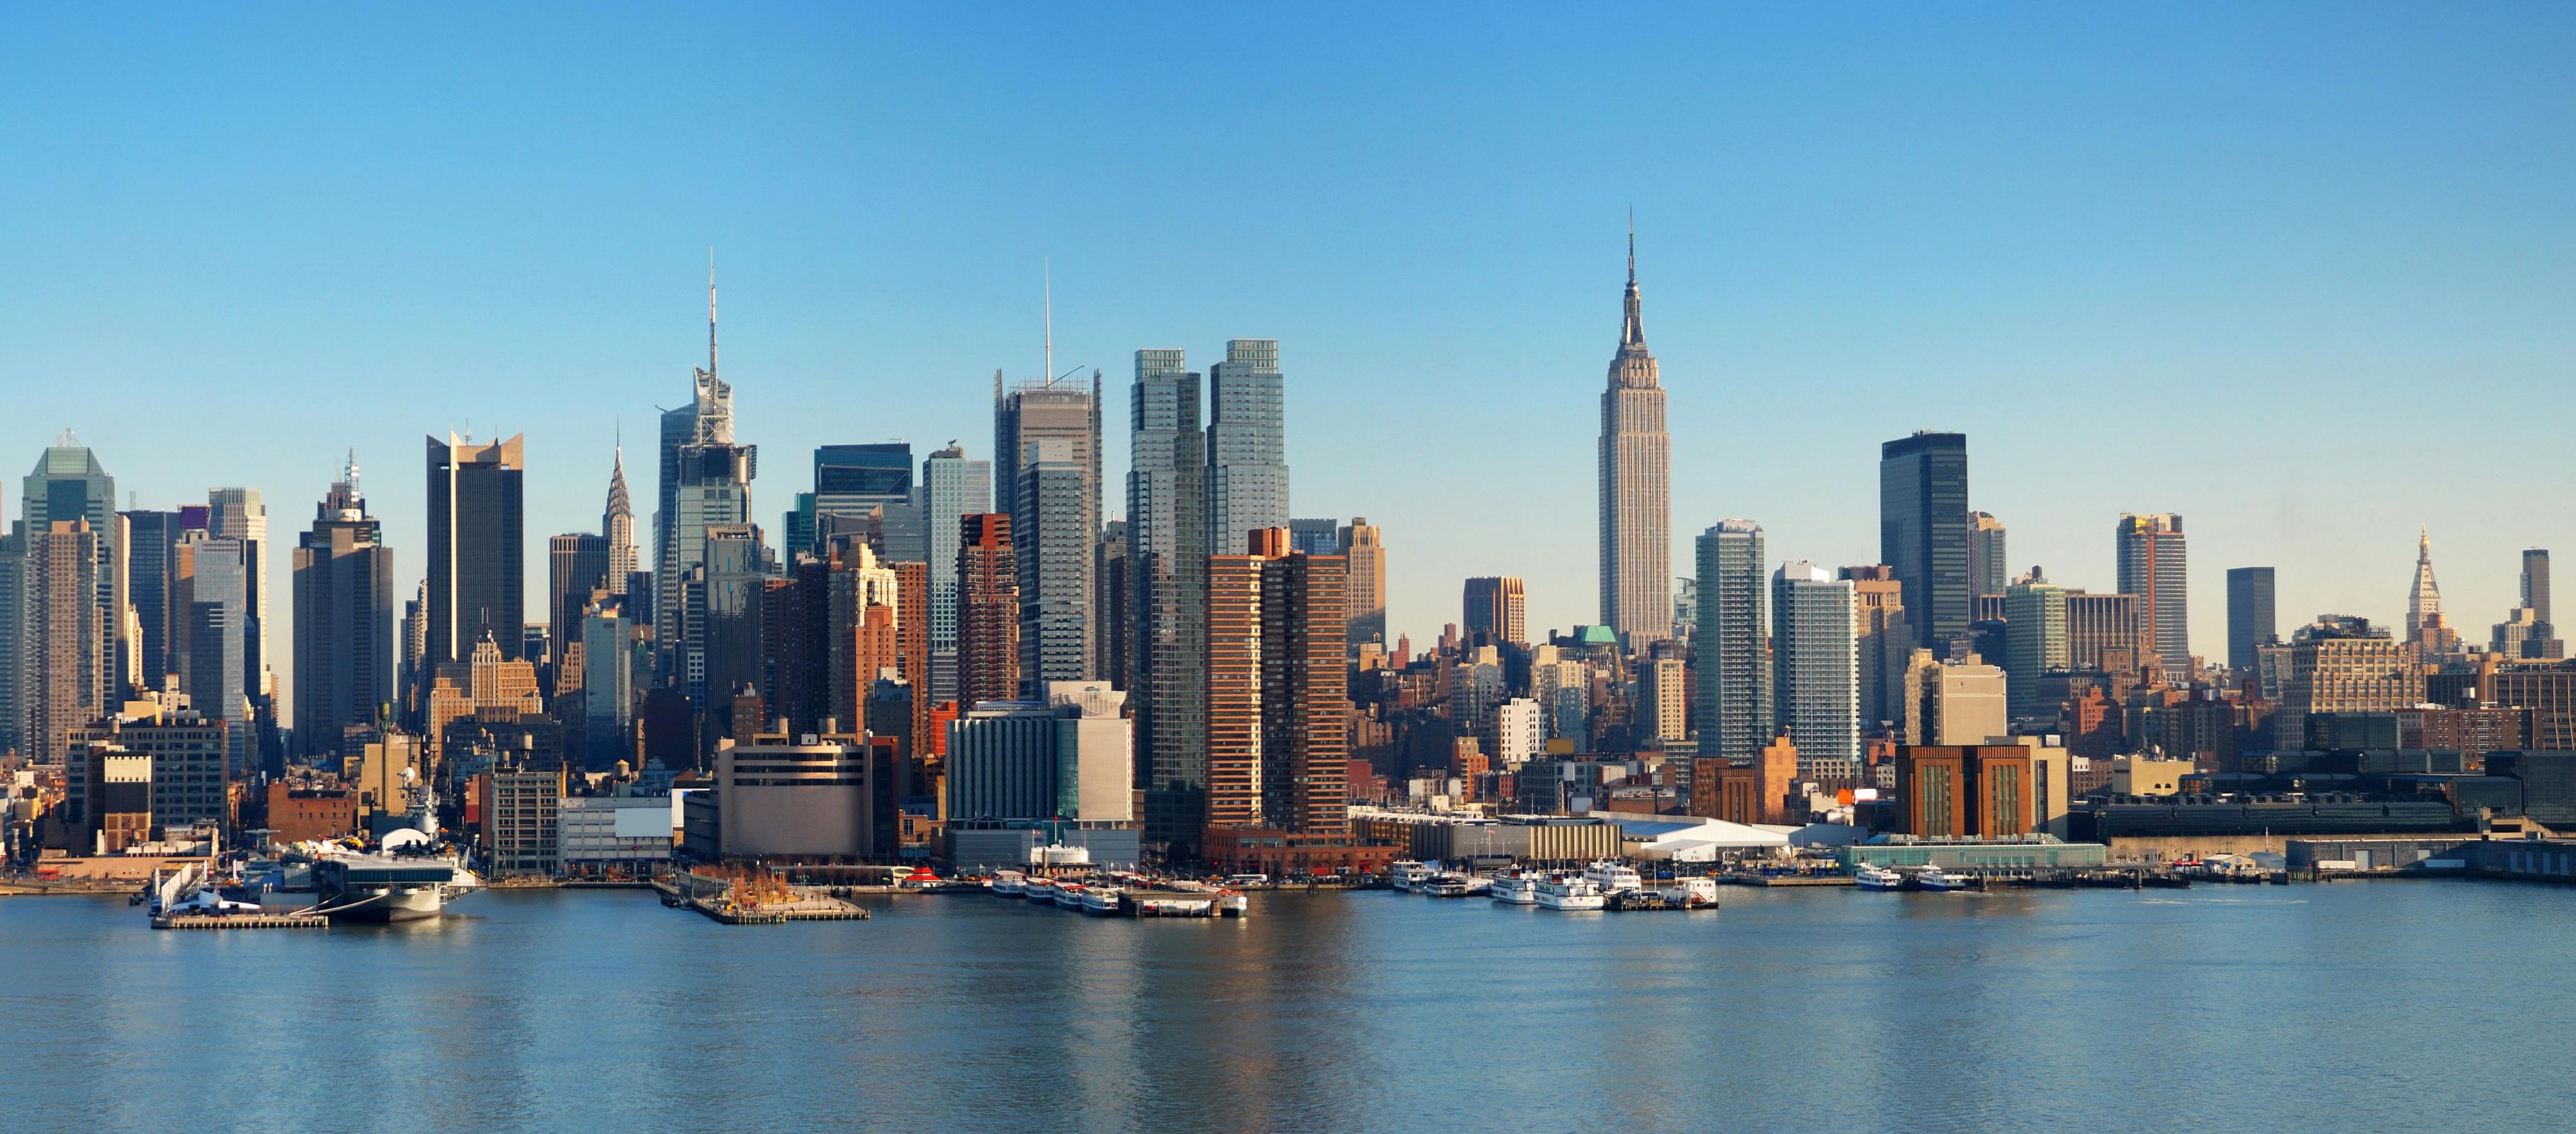 new york city113656369